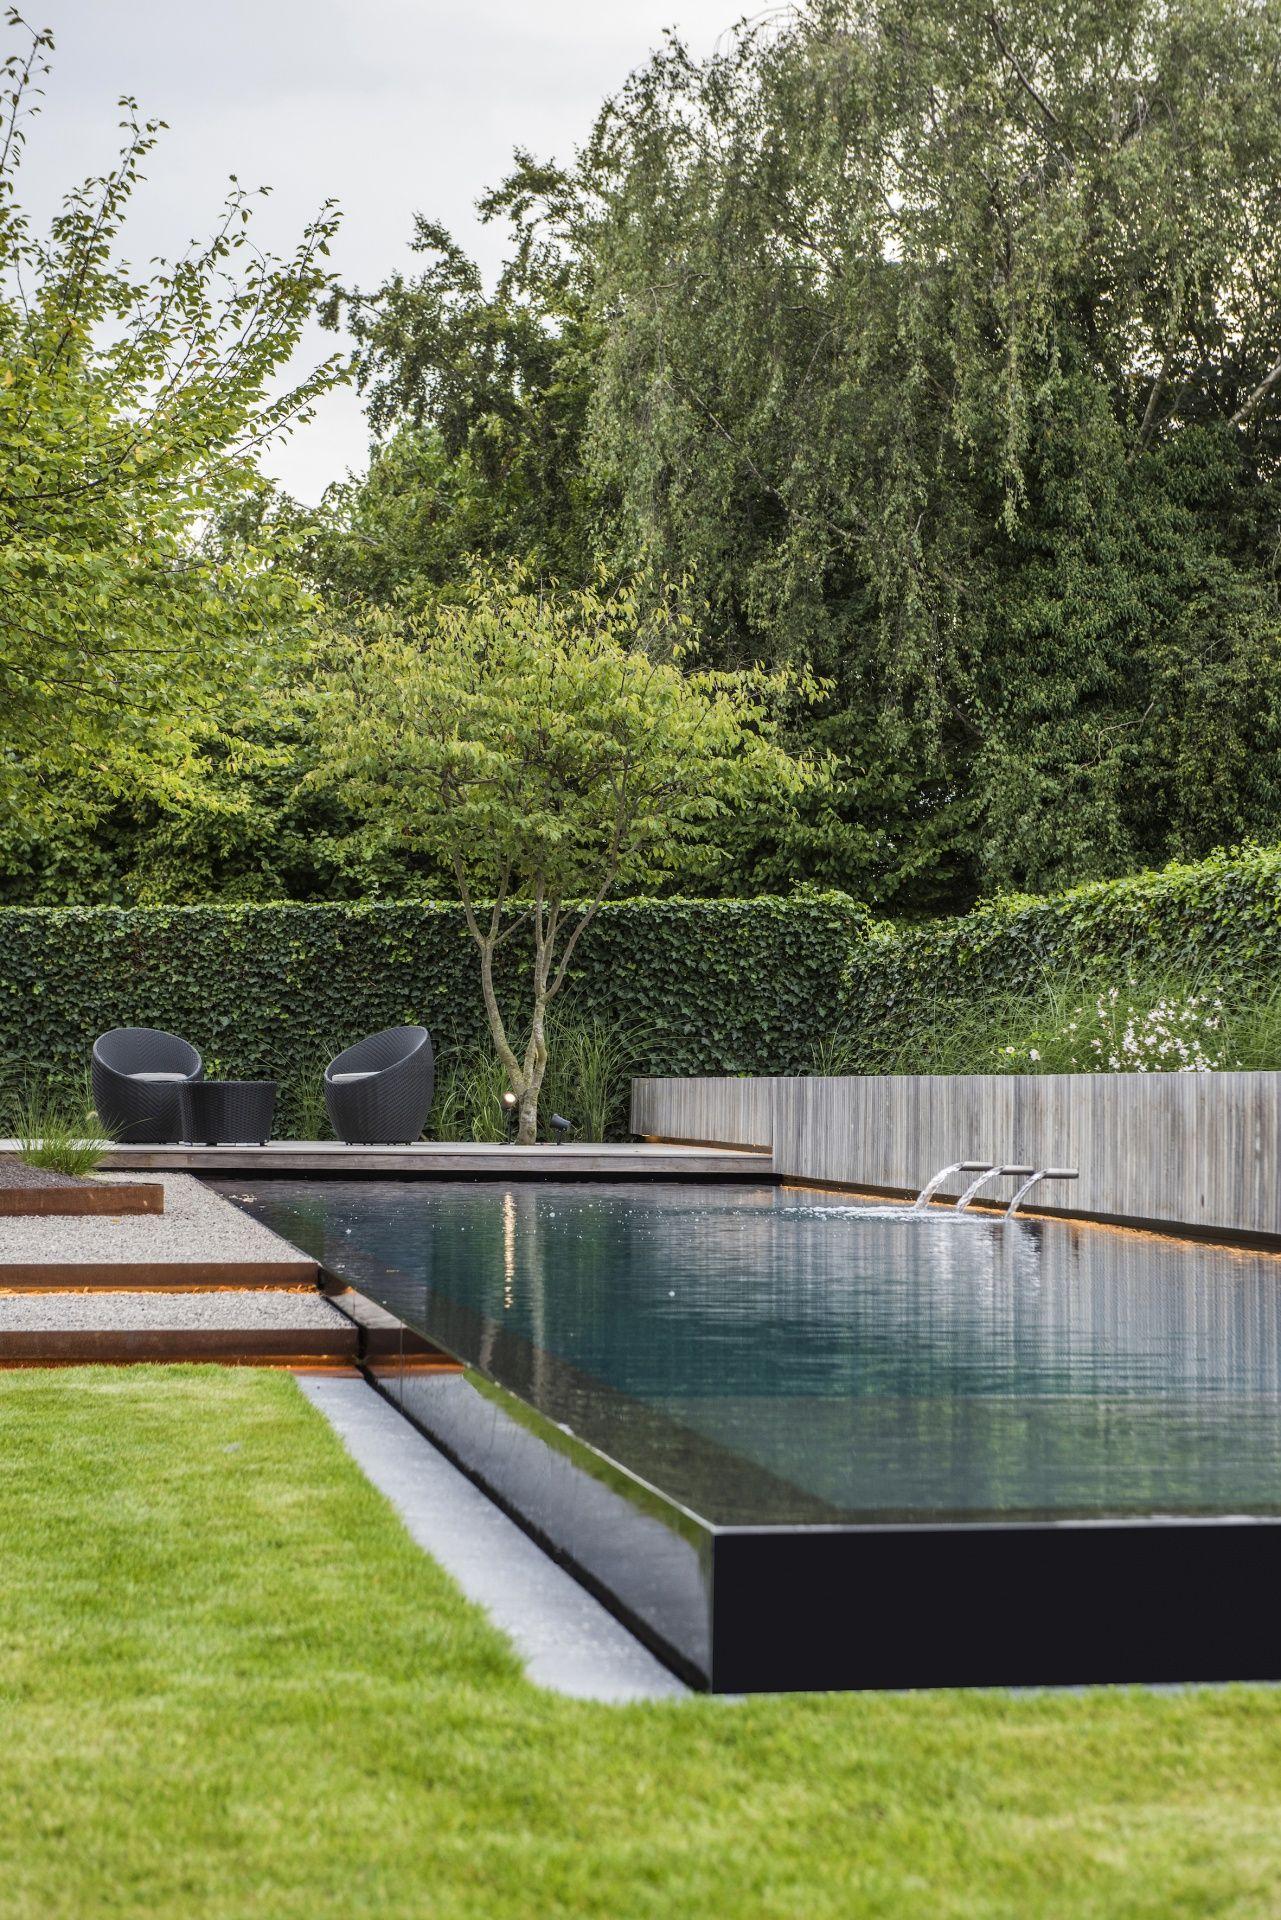 Onze tuinen stijn phlypo tuindesign zwembad vijver for Zwembad achtertuin